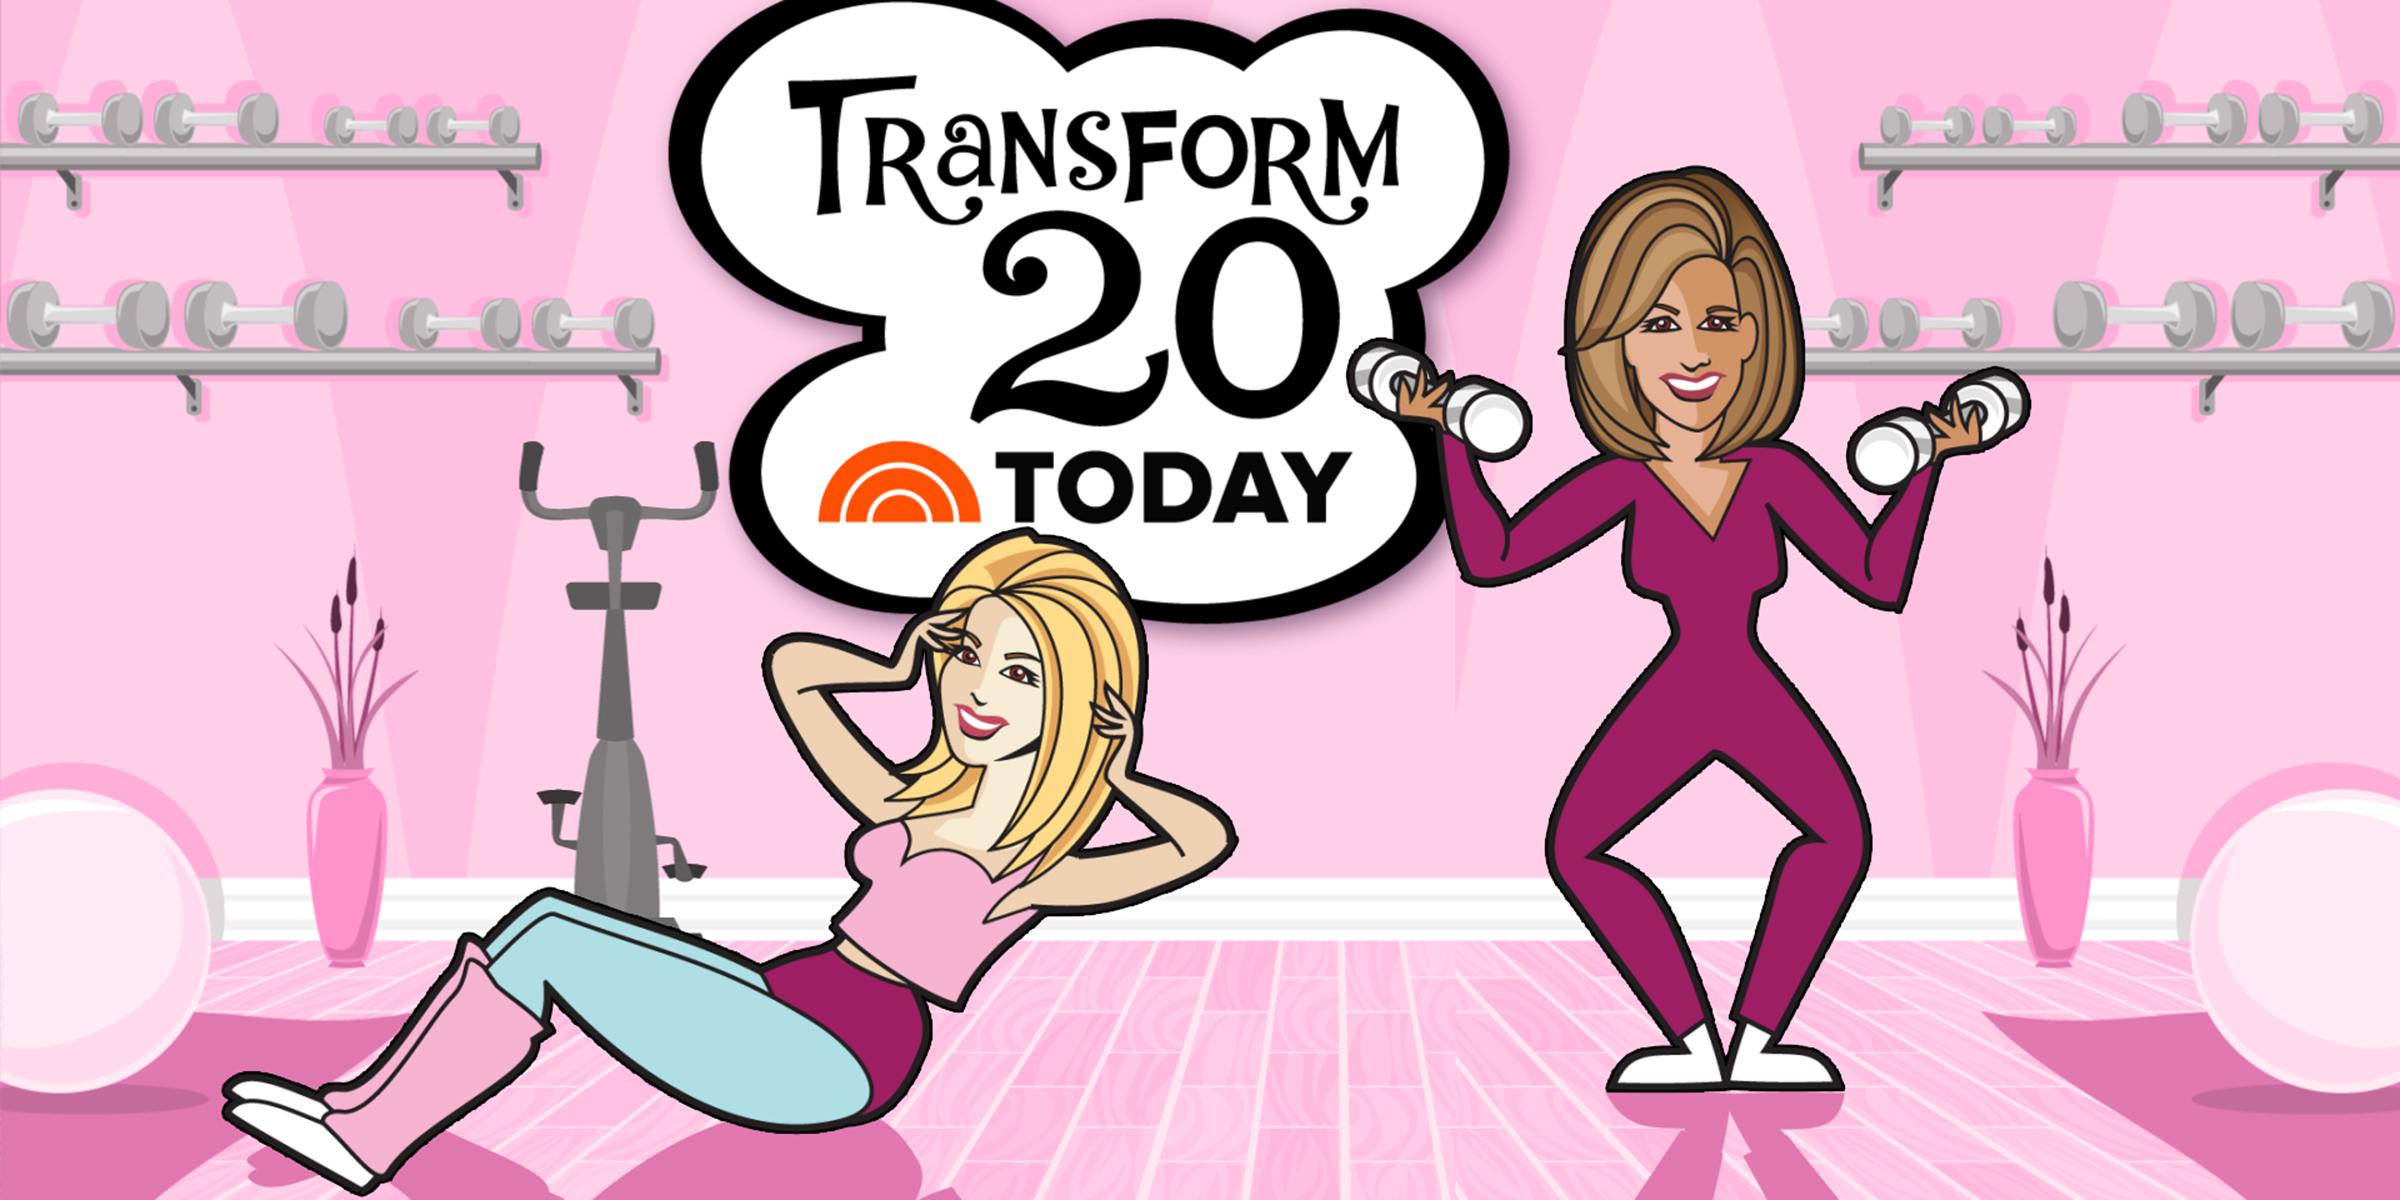 Transform 20: Beachbody trainer Shaun T's new fitness program